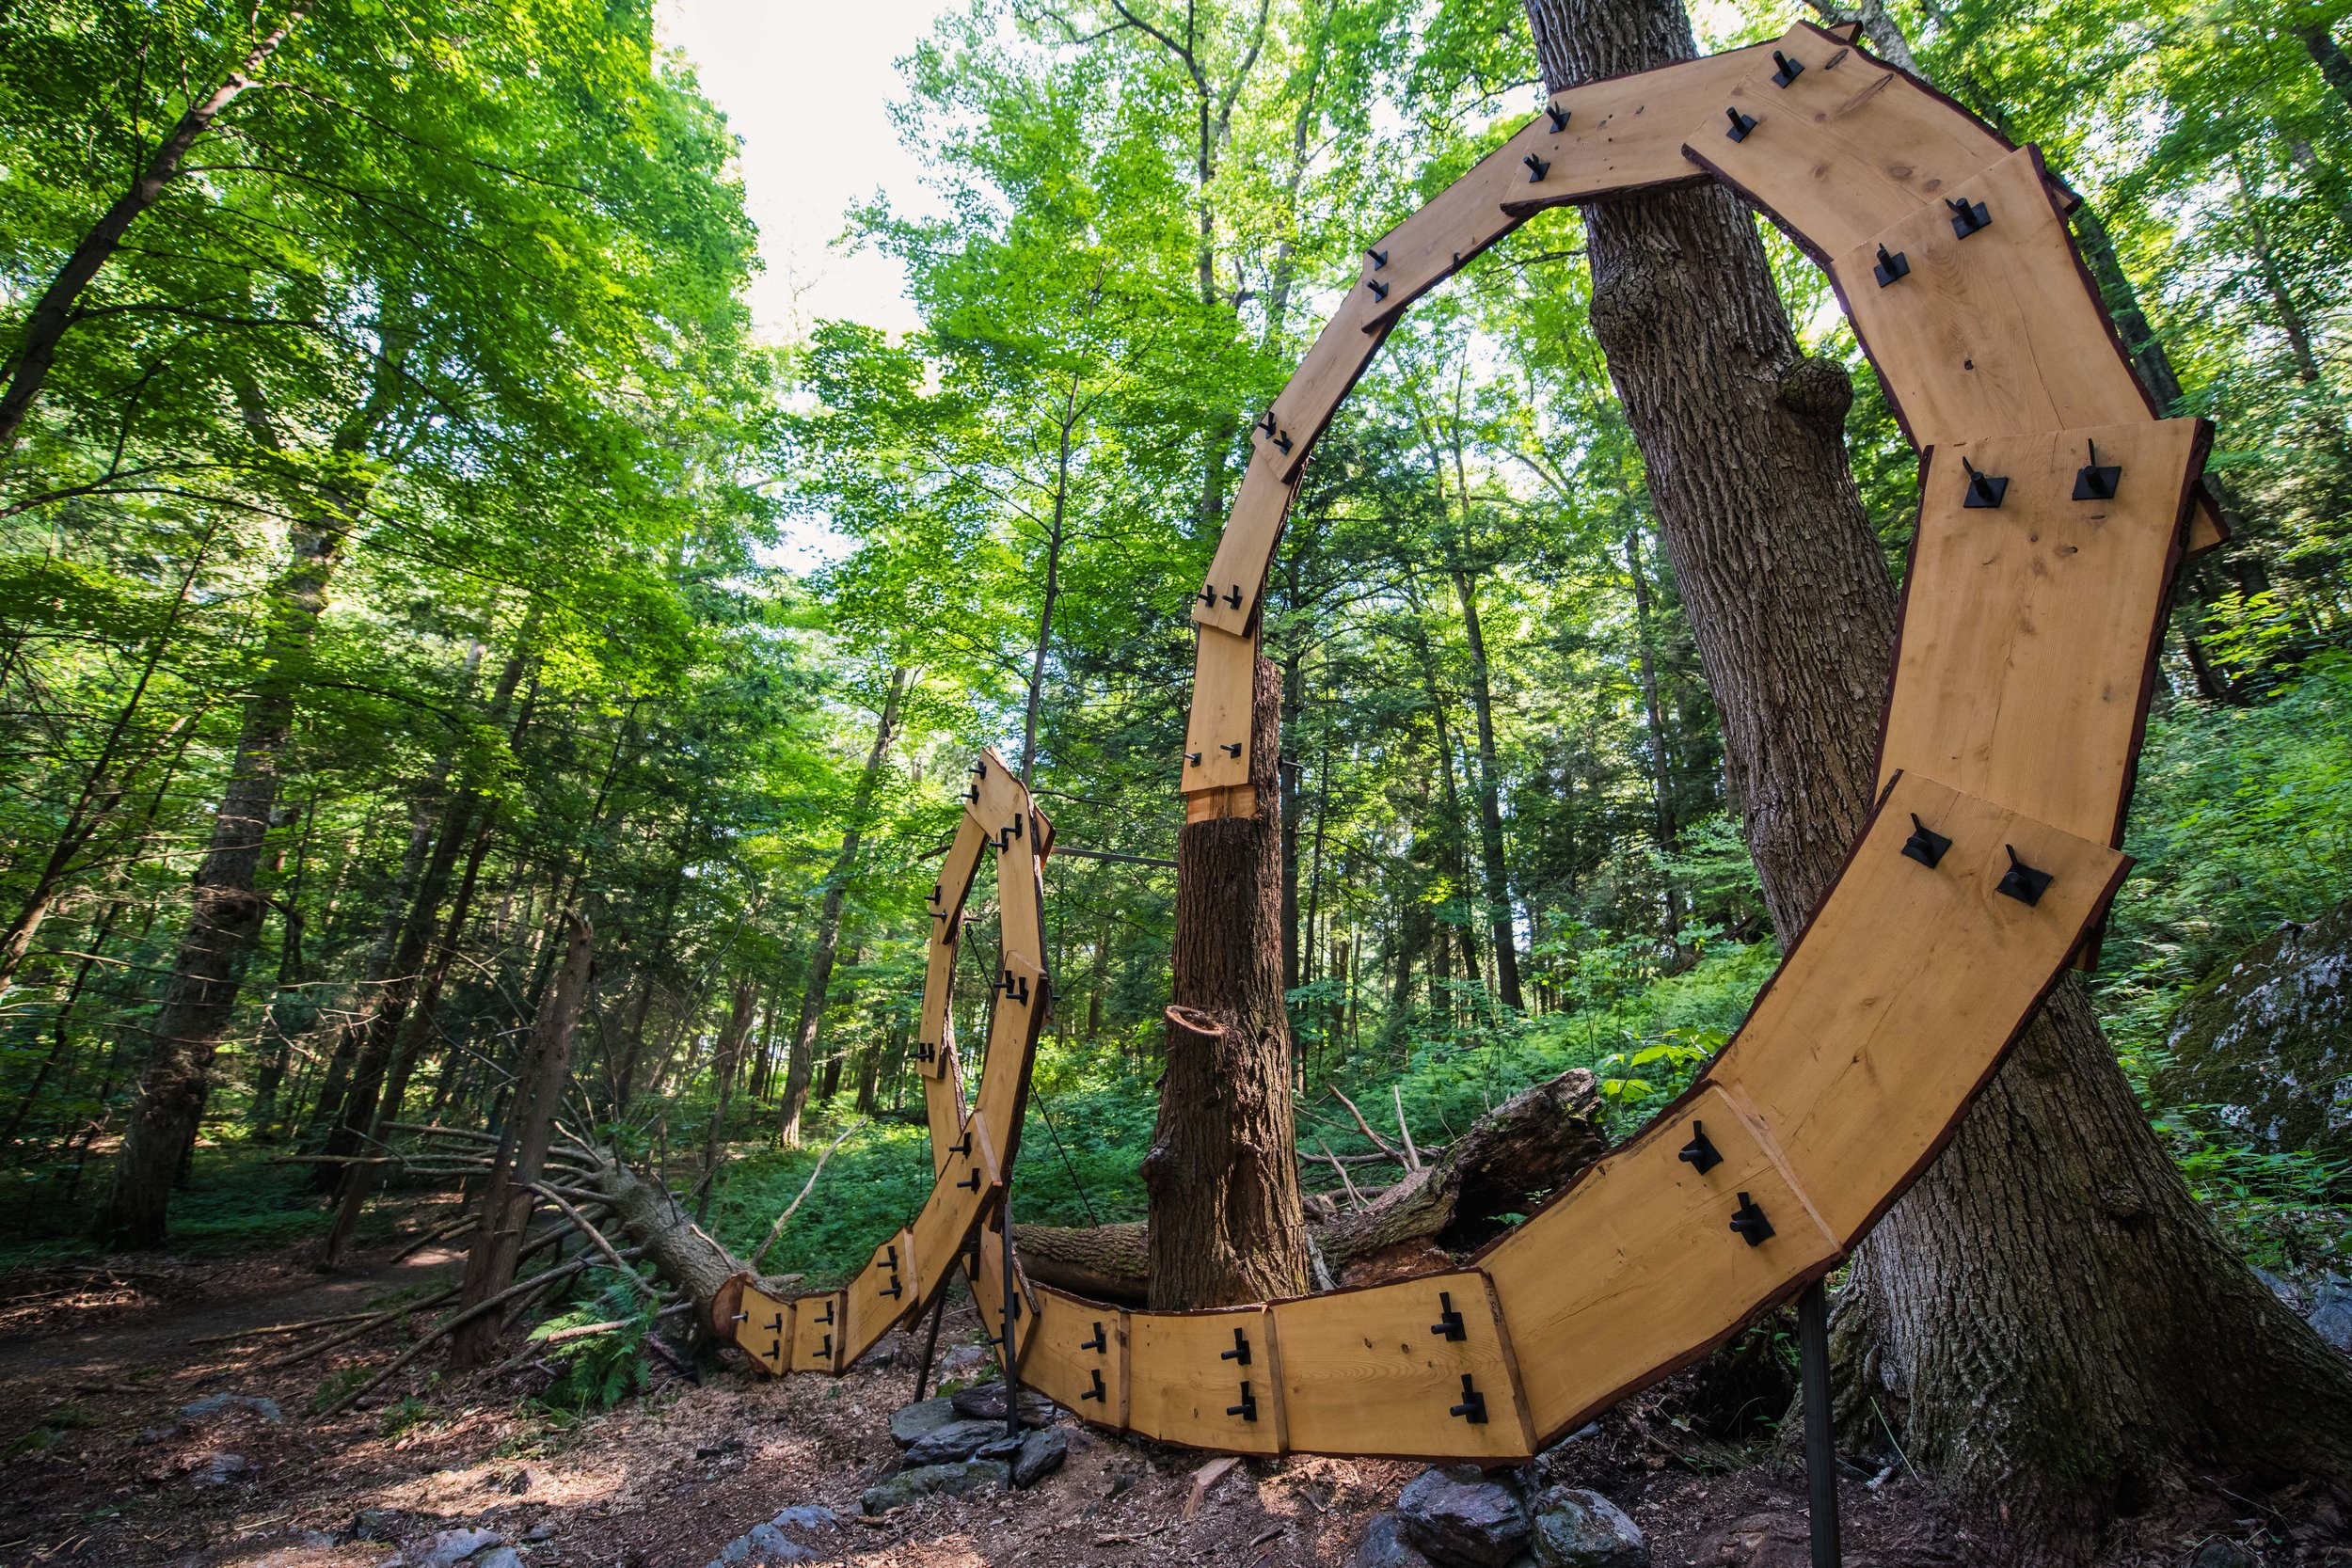 chesterwoodsculpture-1036.jpg